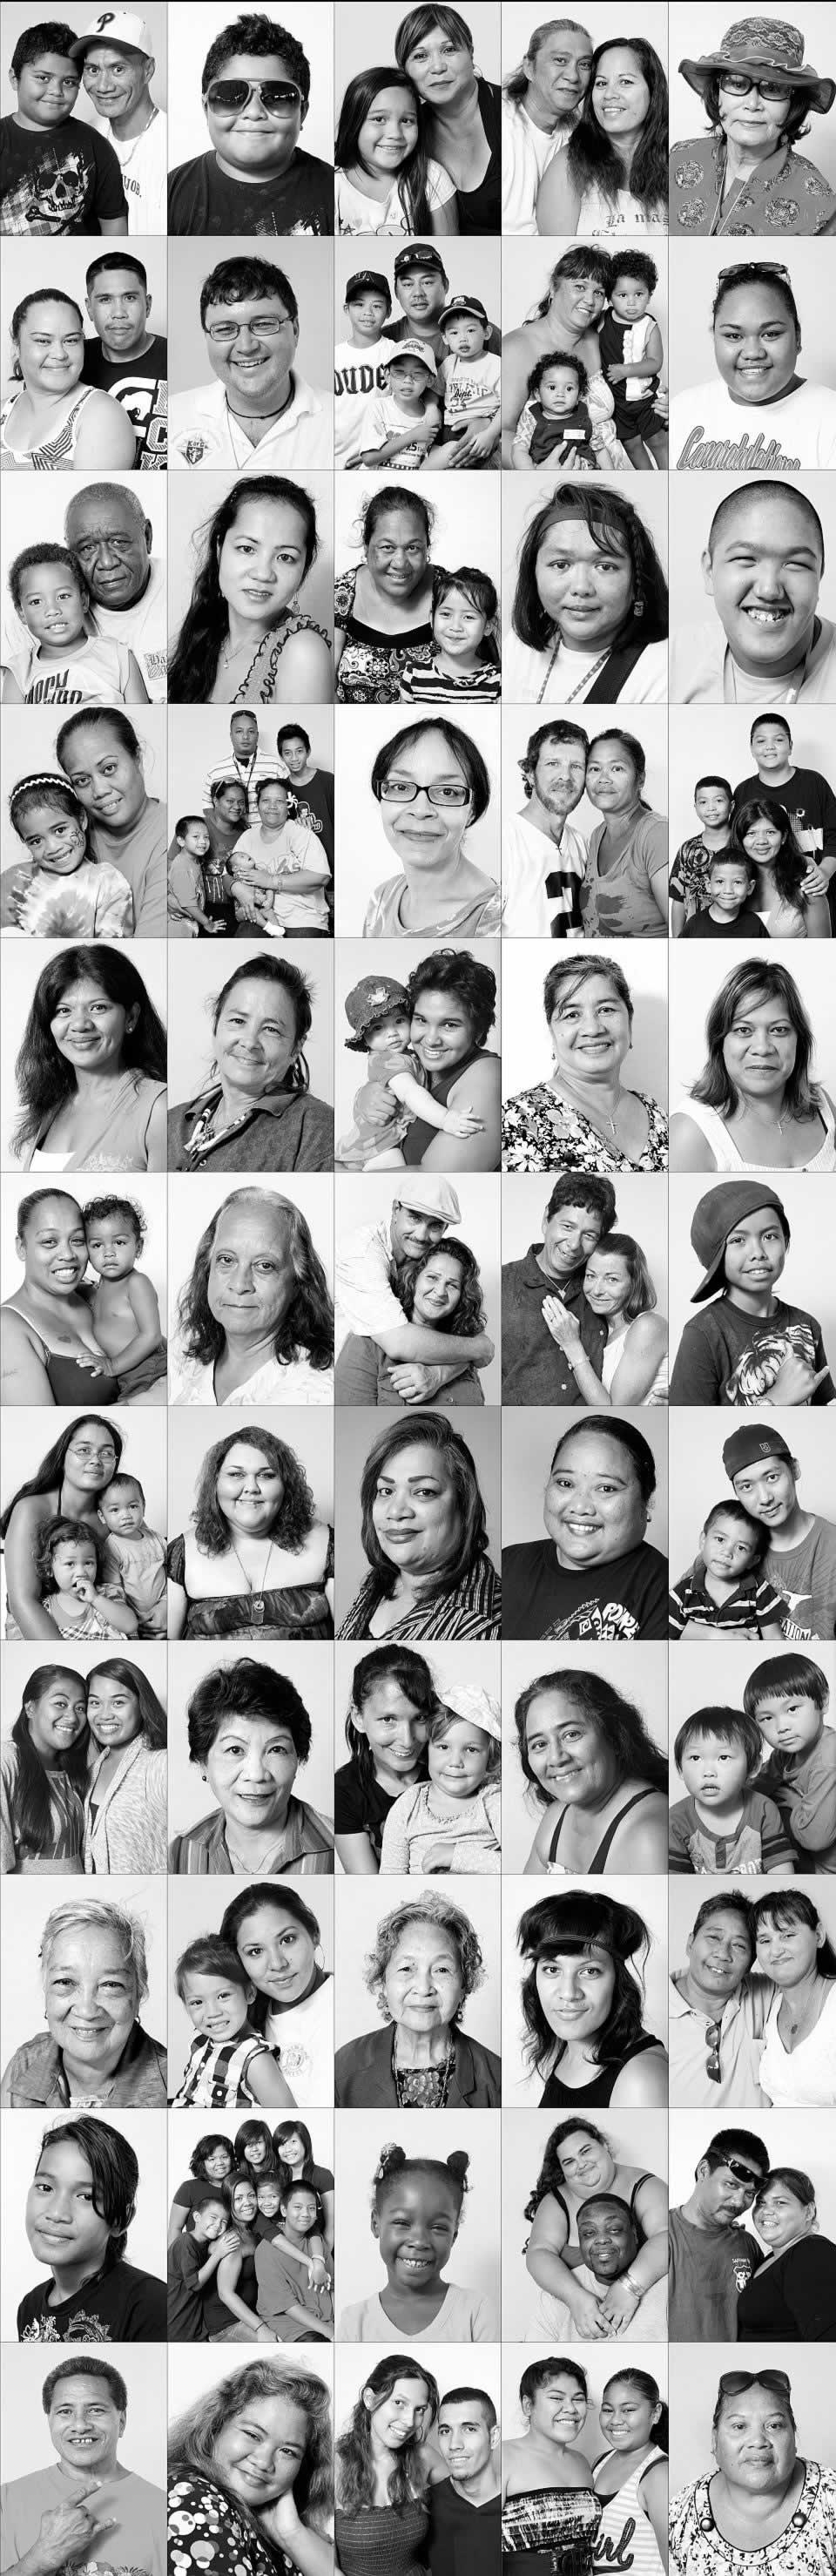 convoy of hope - portraits